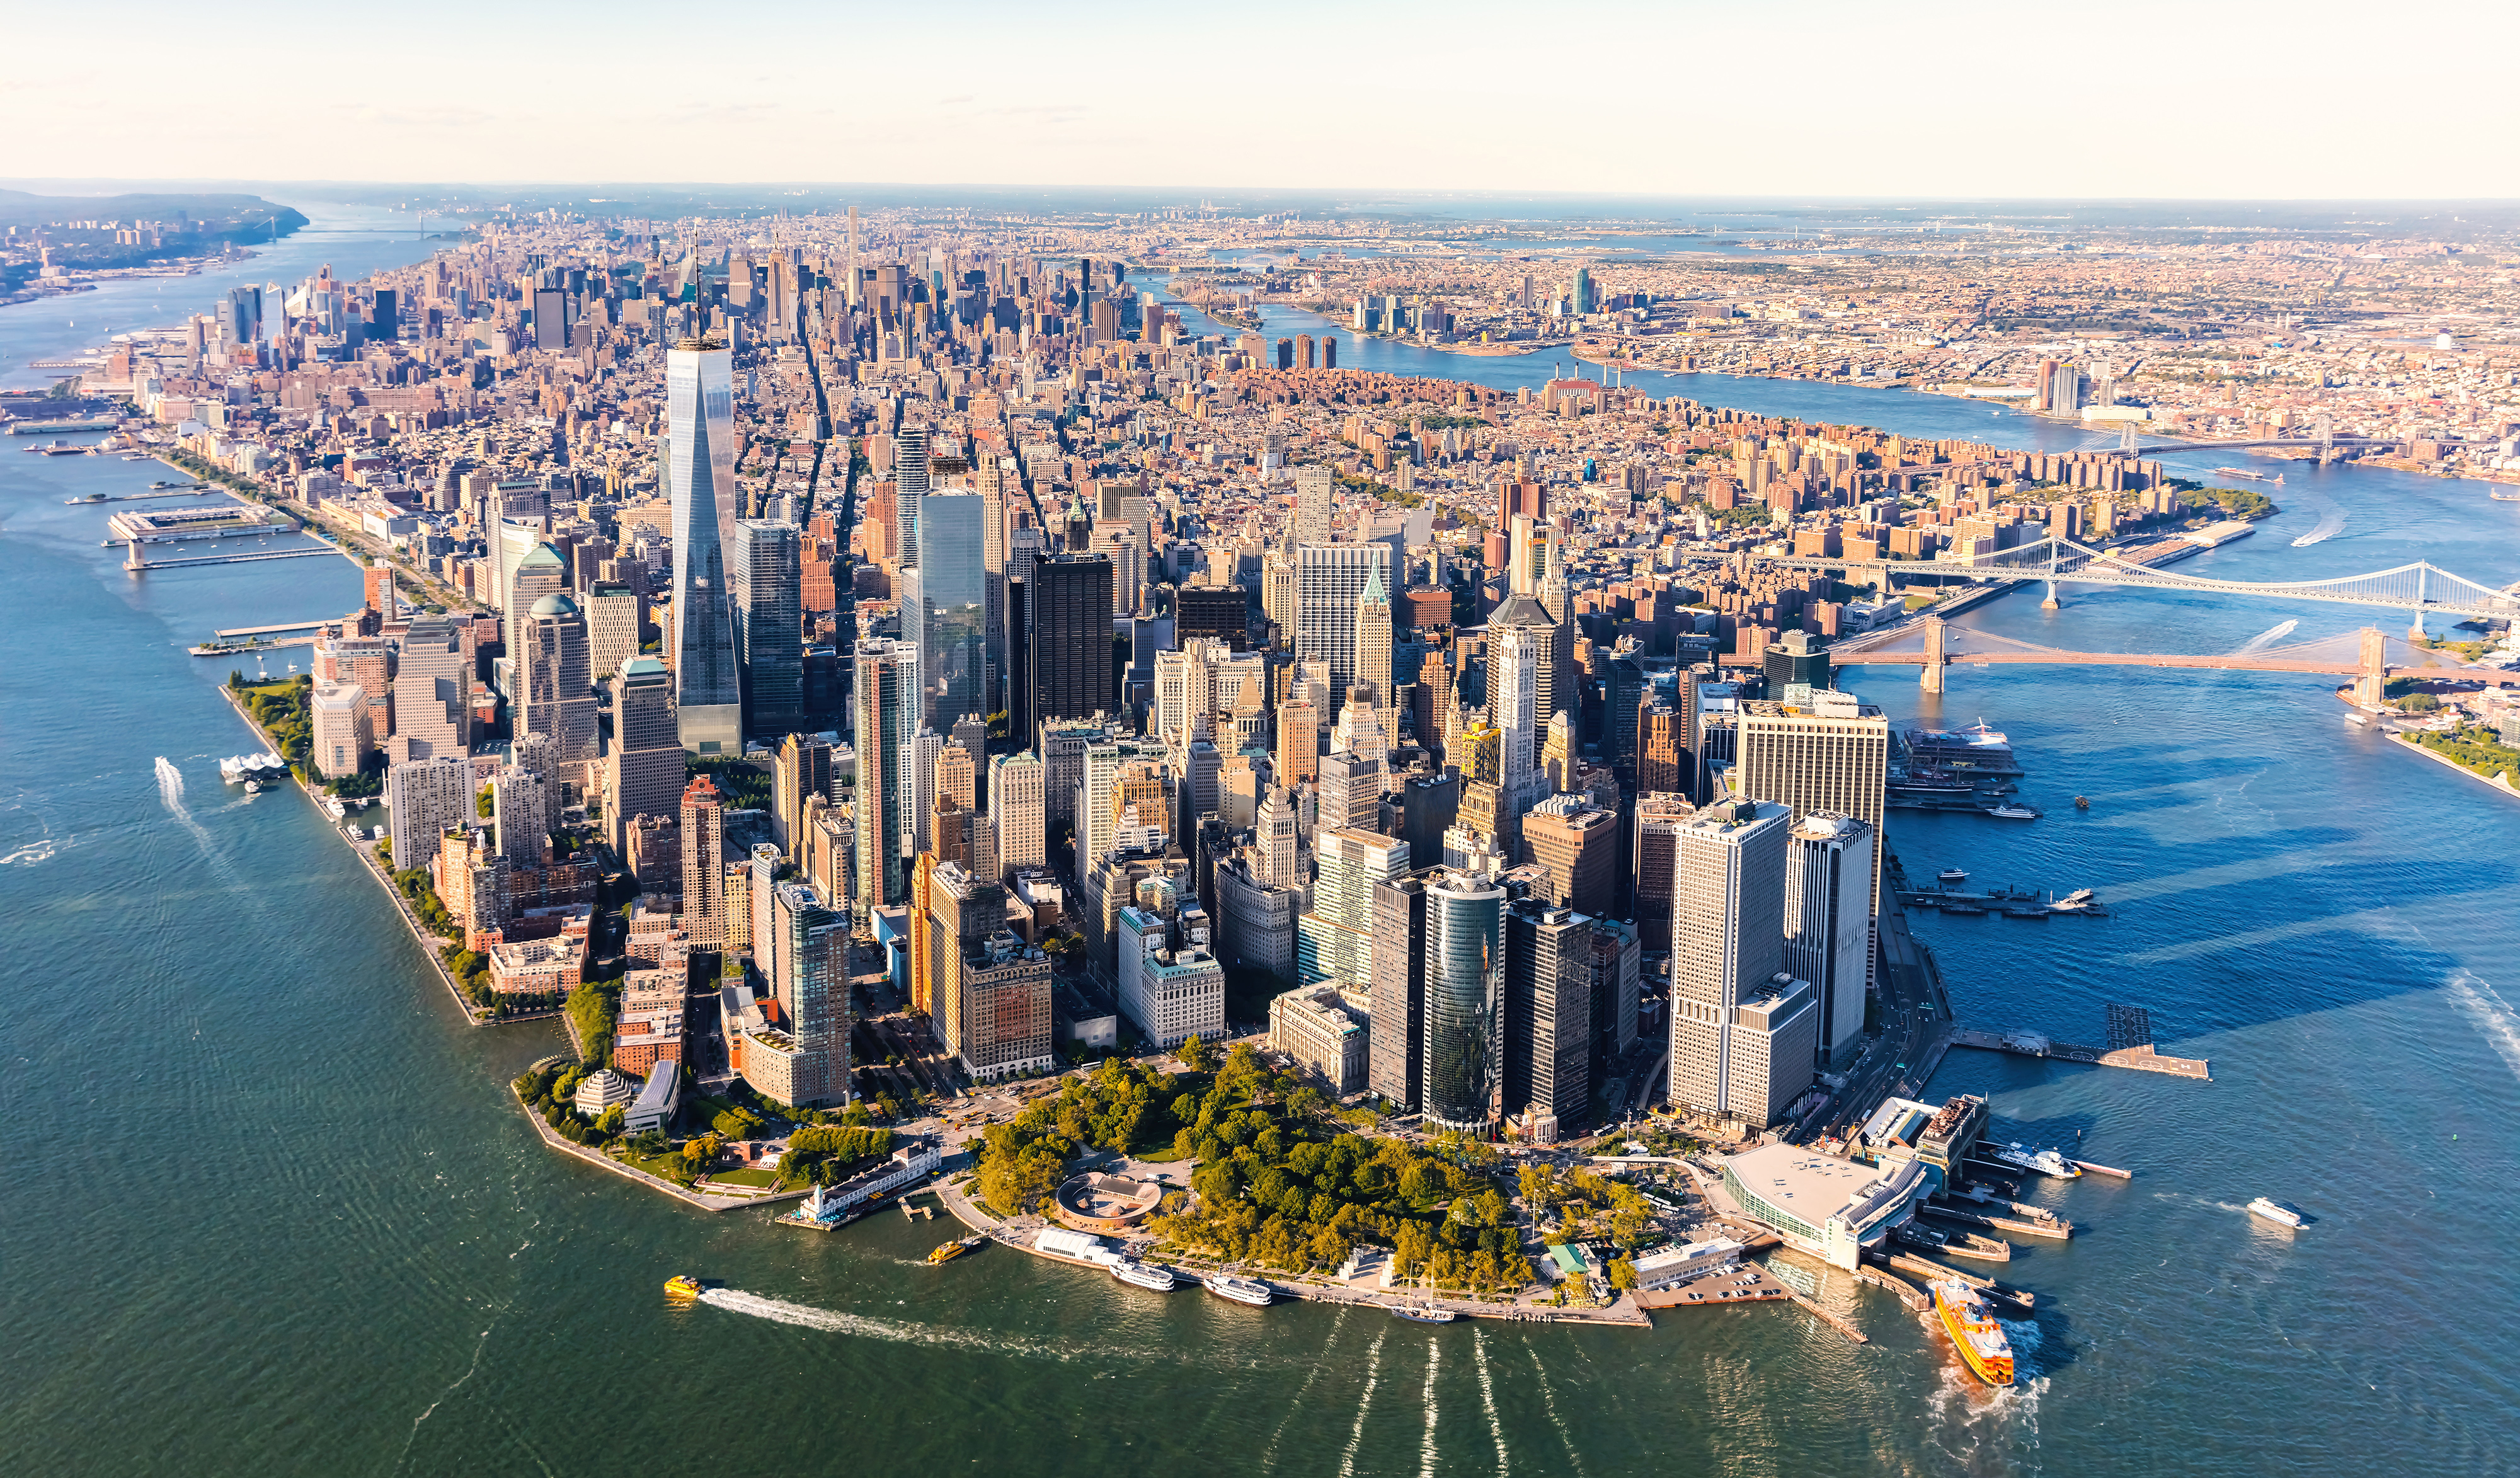 INTO Drew aerial view city